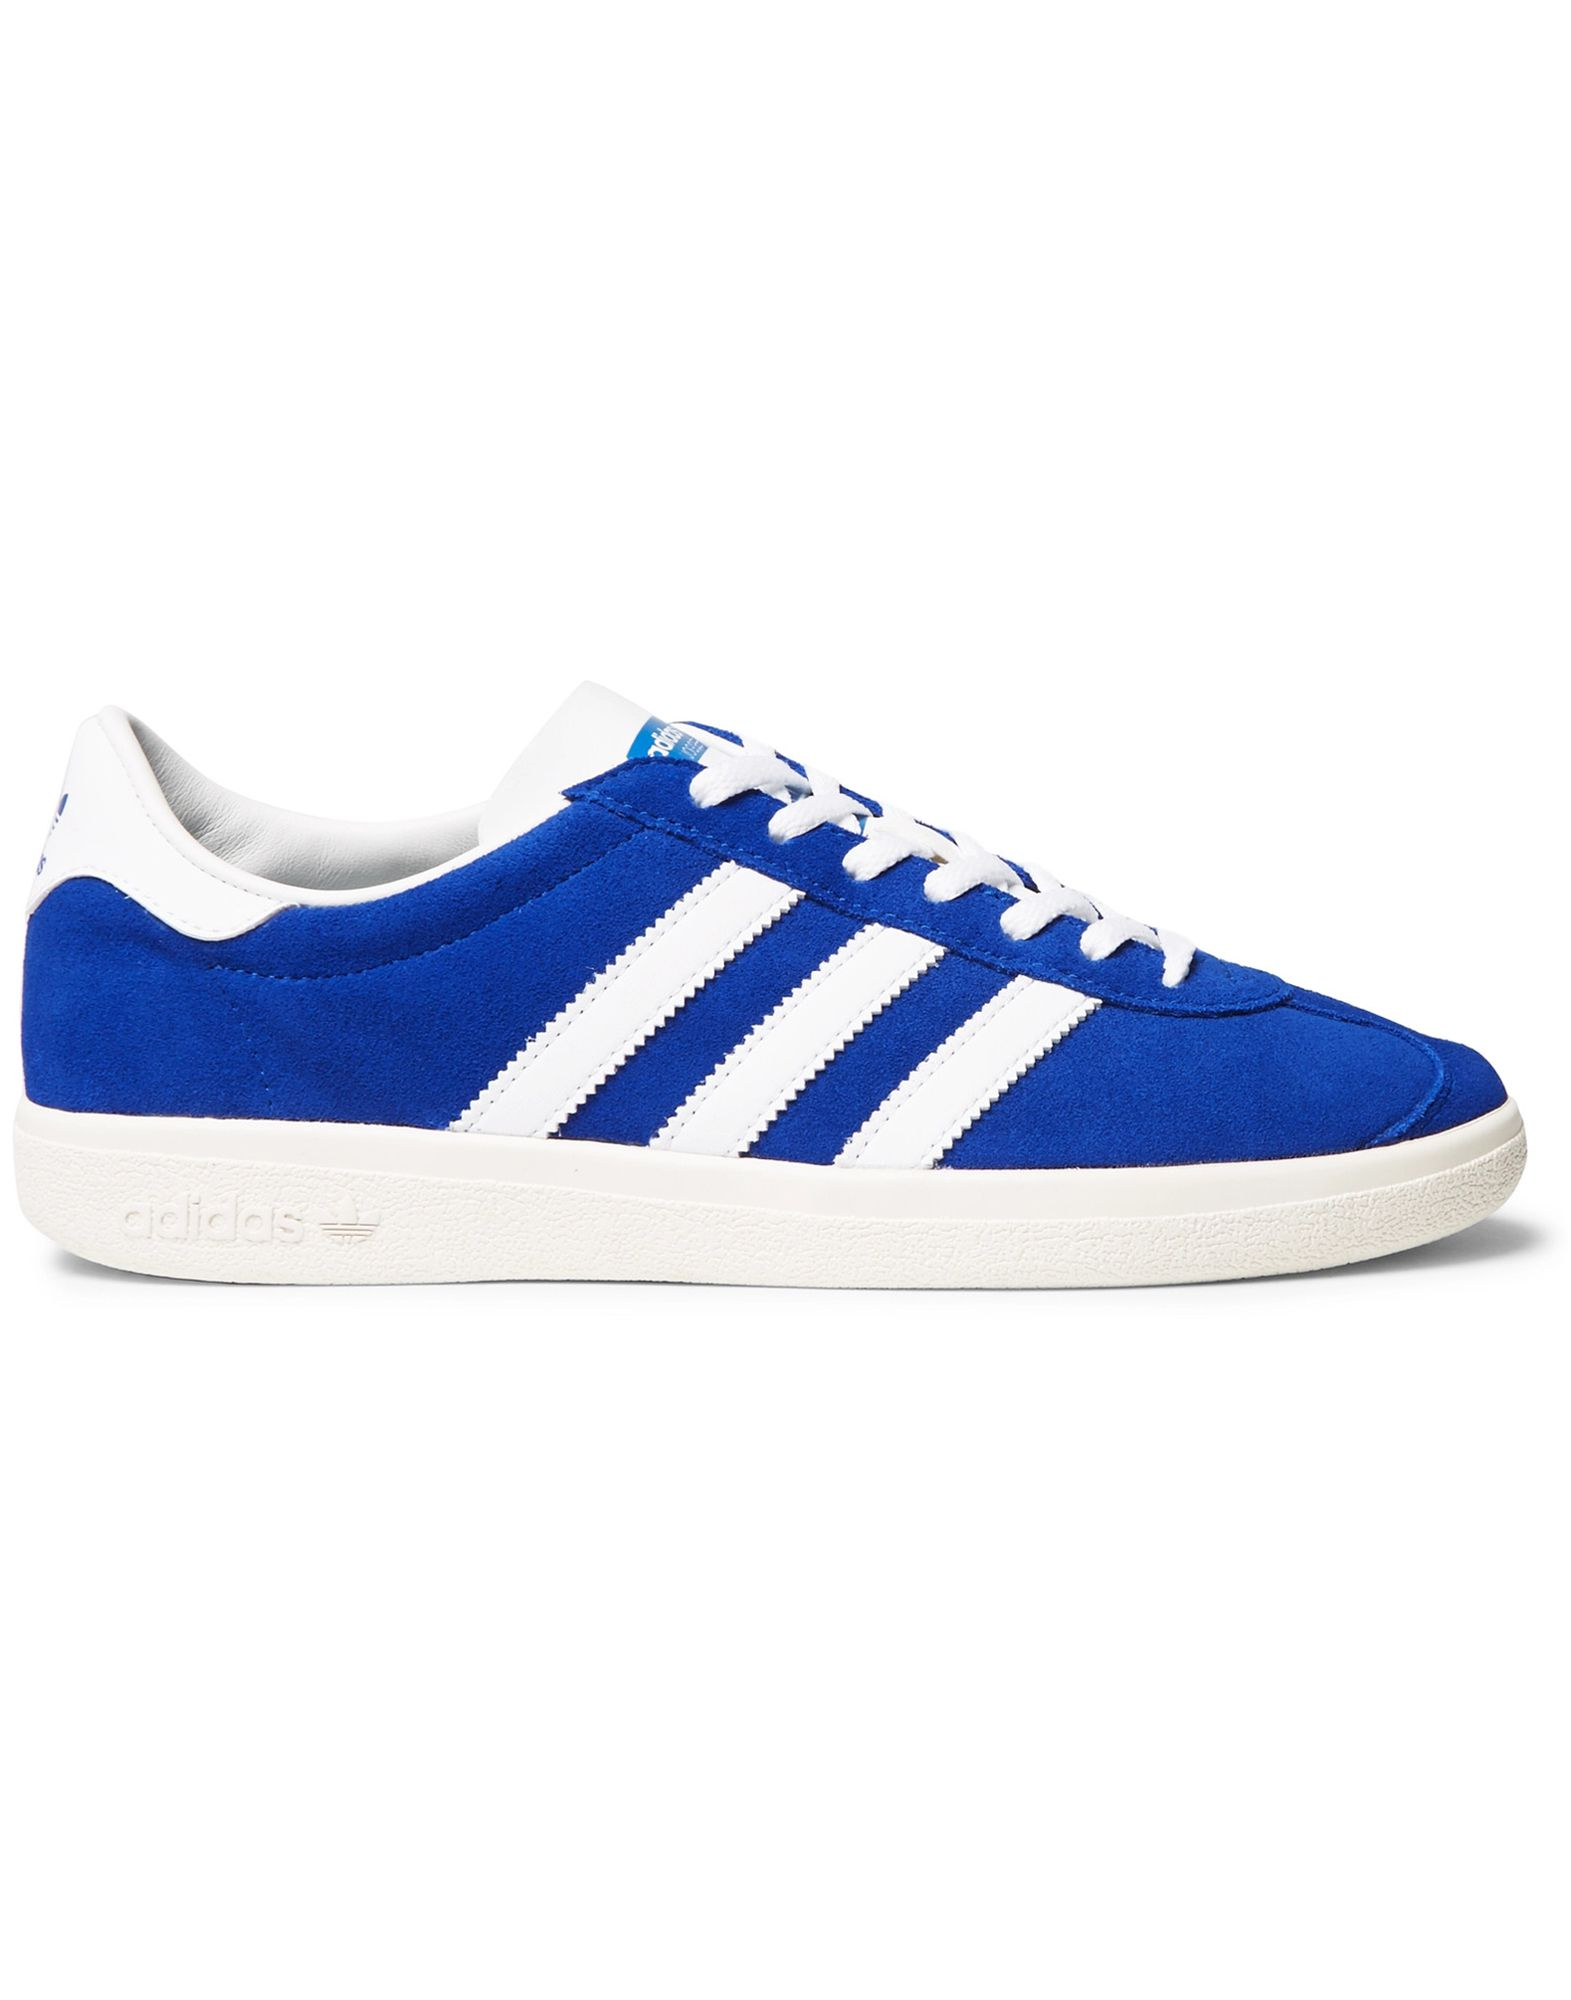 Sneakers Adidas Originals Uomo - 11540759TK